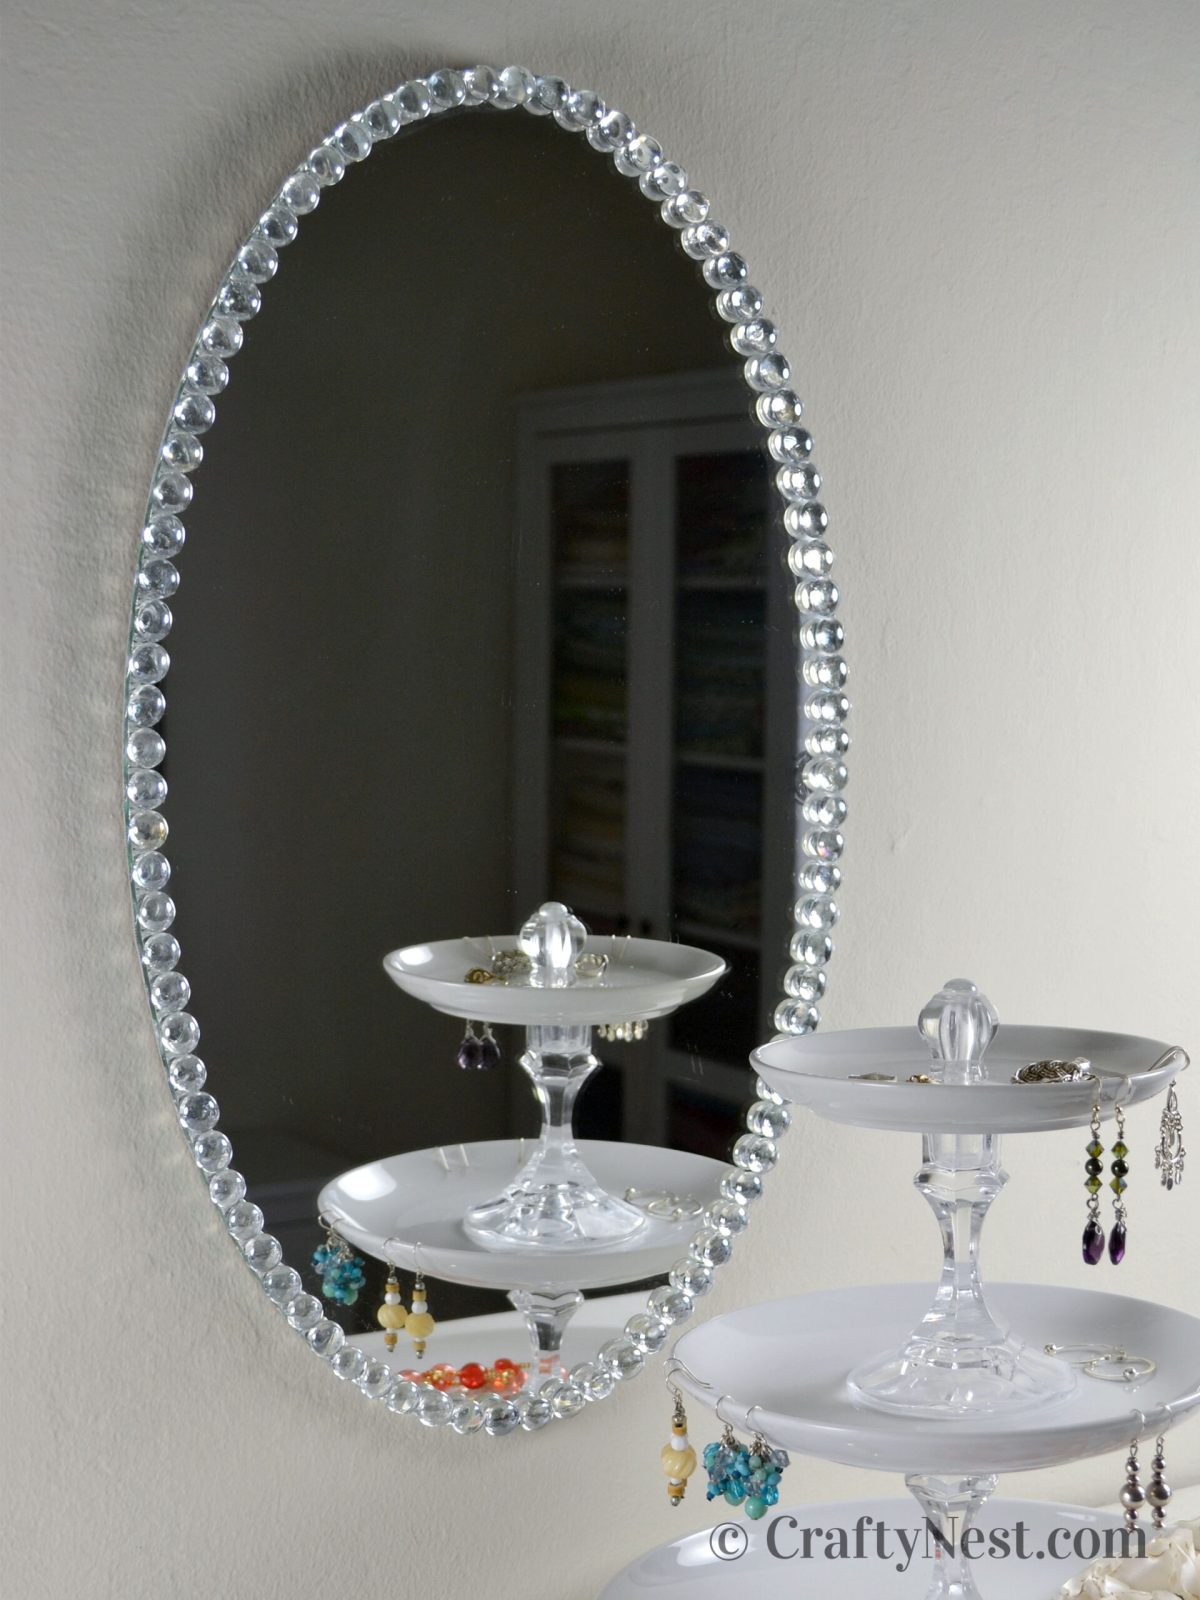 Oval beaded-glass-framed mirror, photo